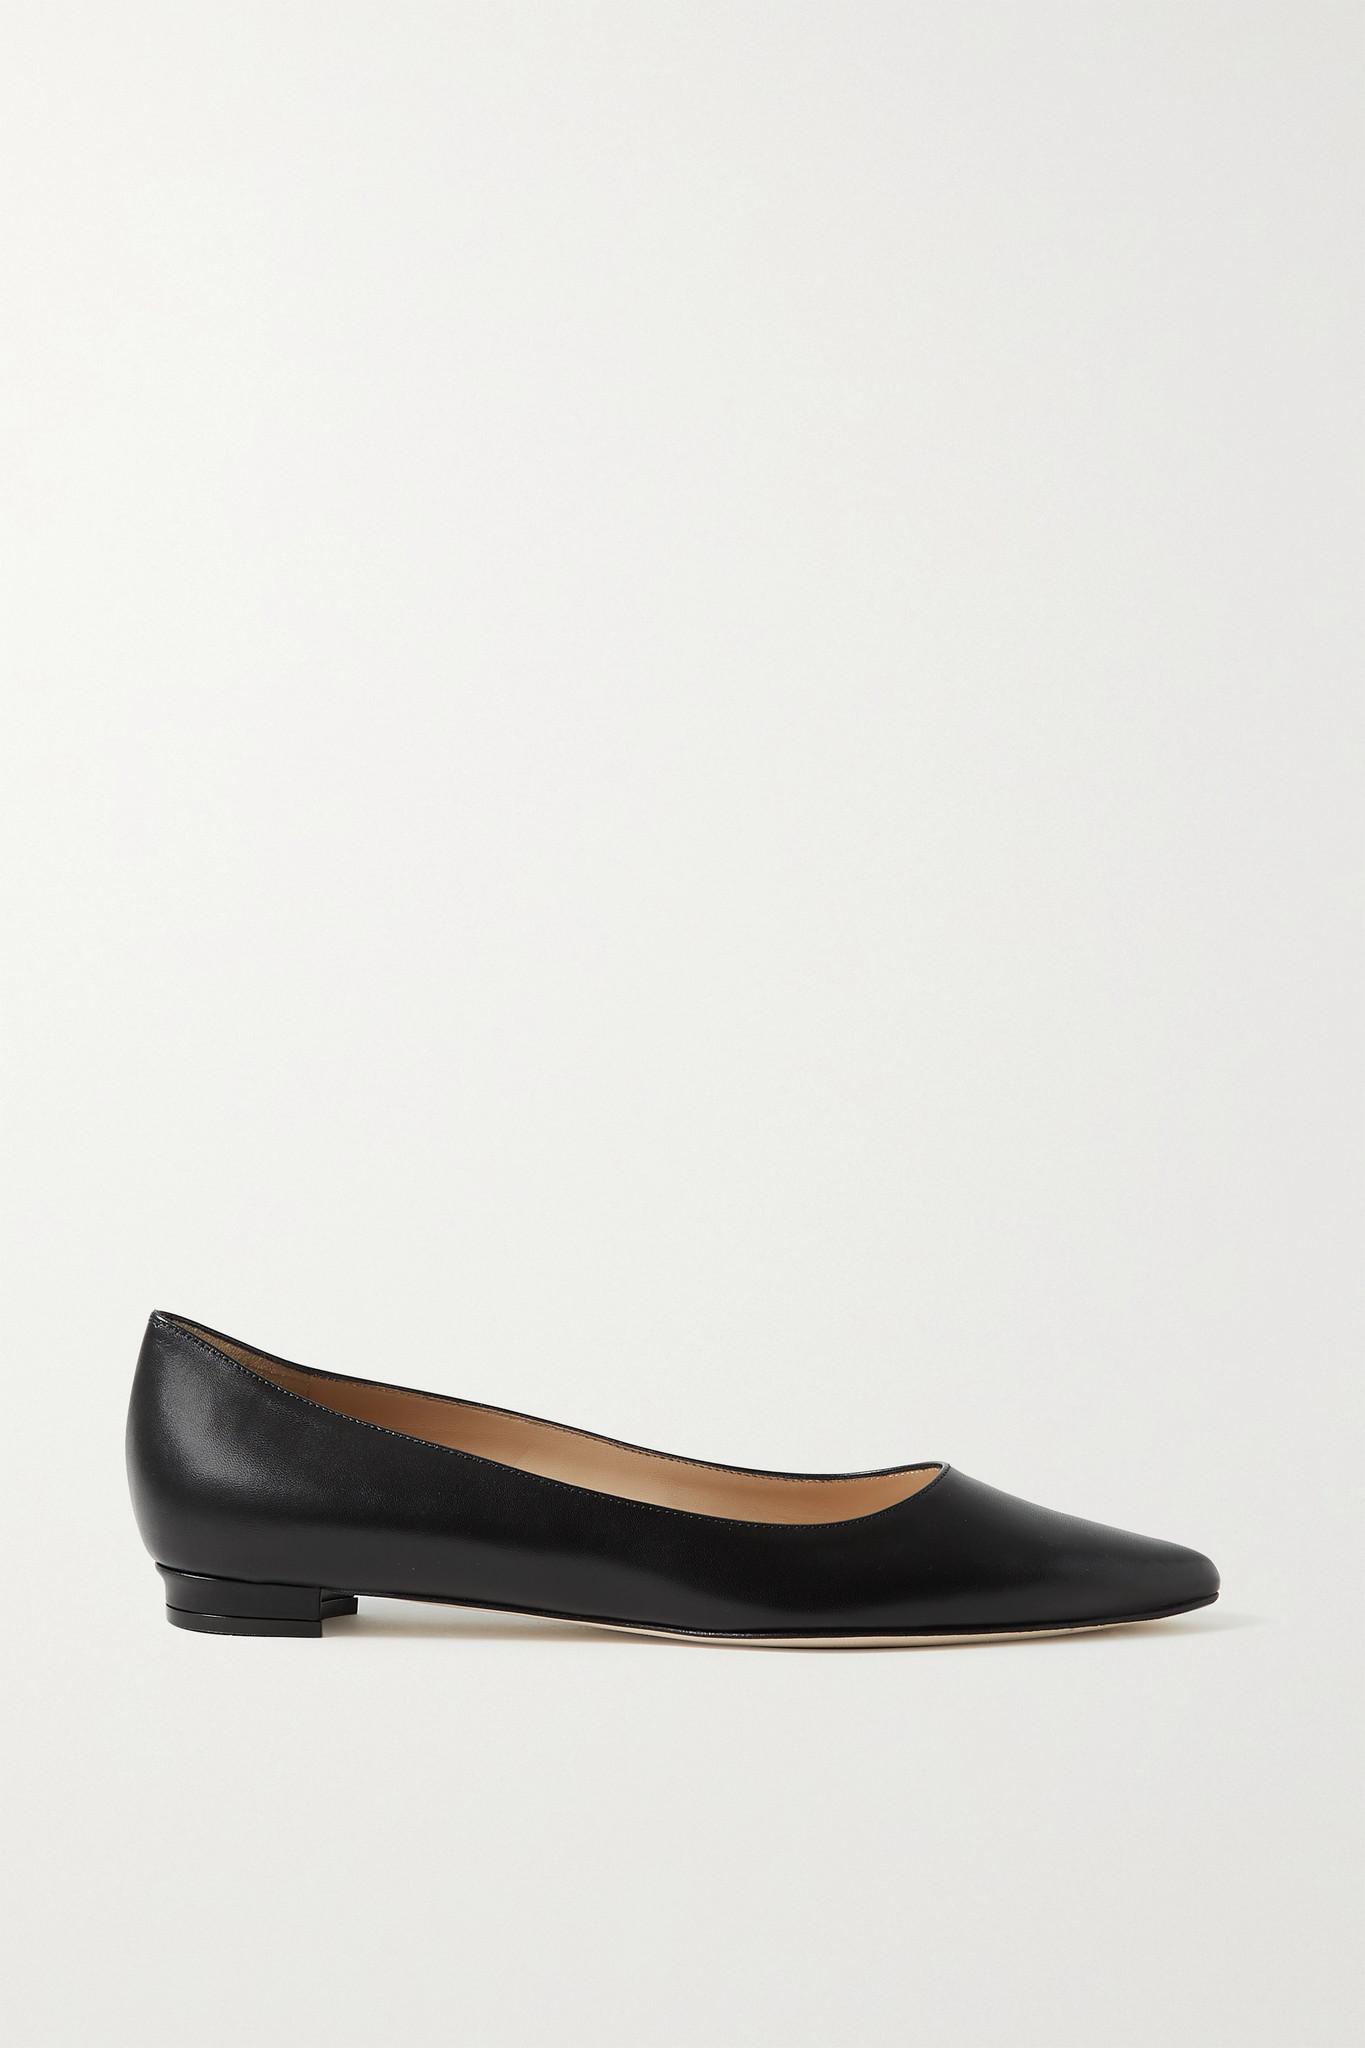 MANOLO BLAHNIK - Titto Leather Point-toe Flats - Black - IT39